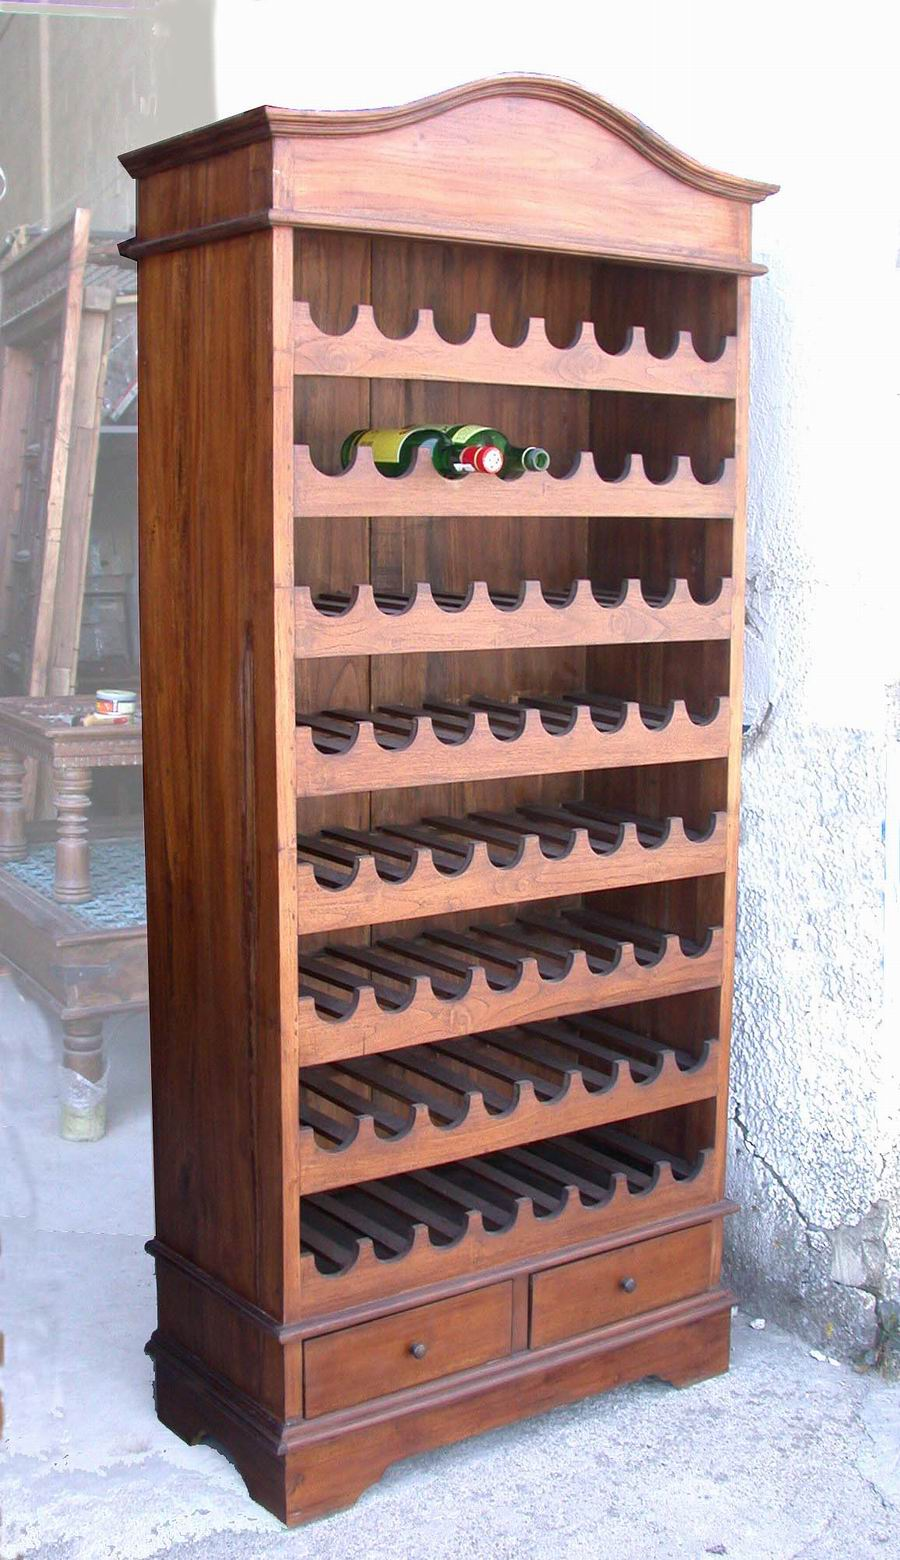 Botelleros muebles botelleros cajas de madera estuches - Mueble botellero cocina ...